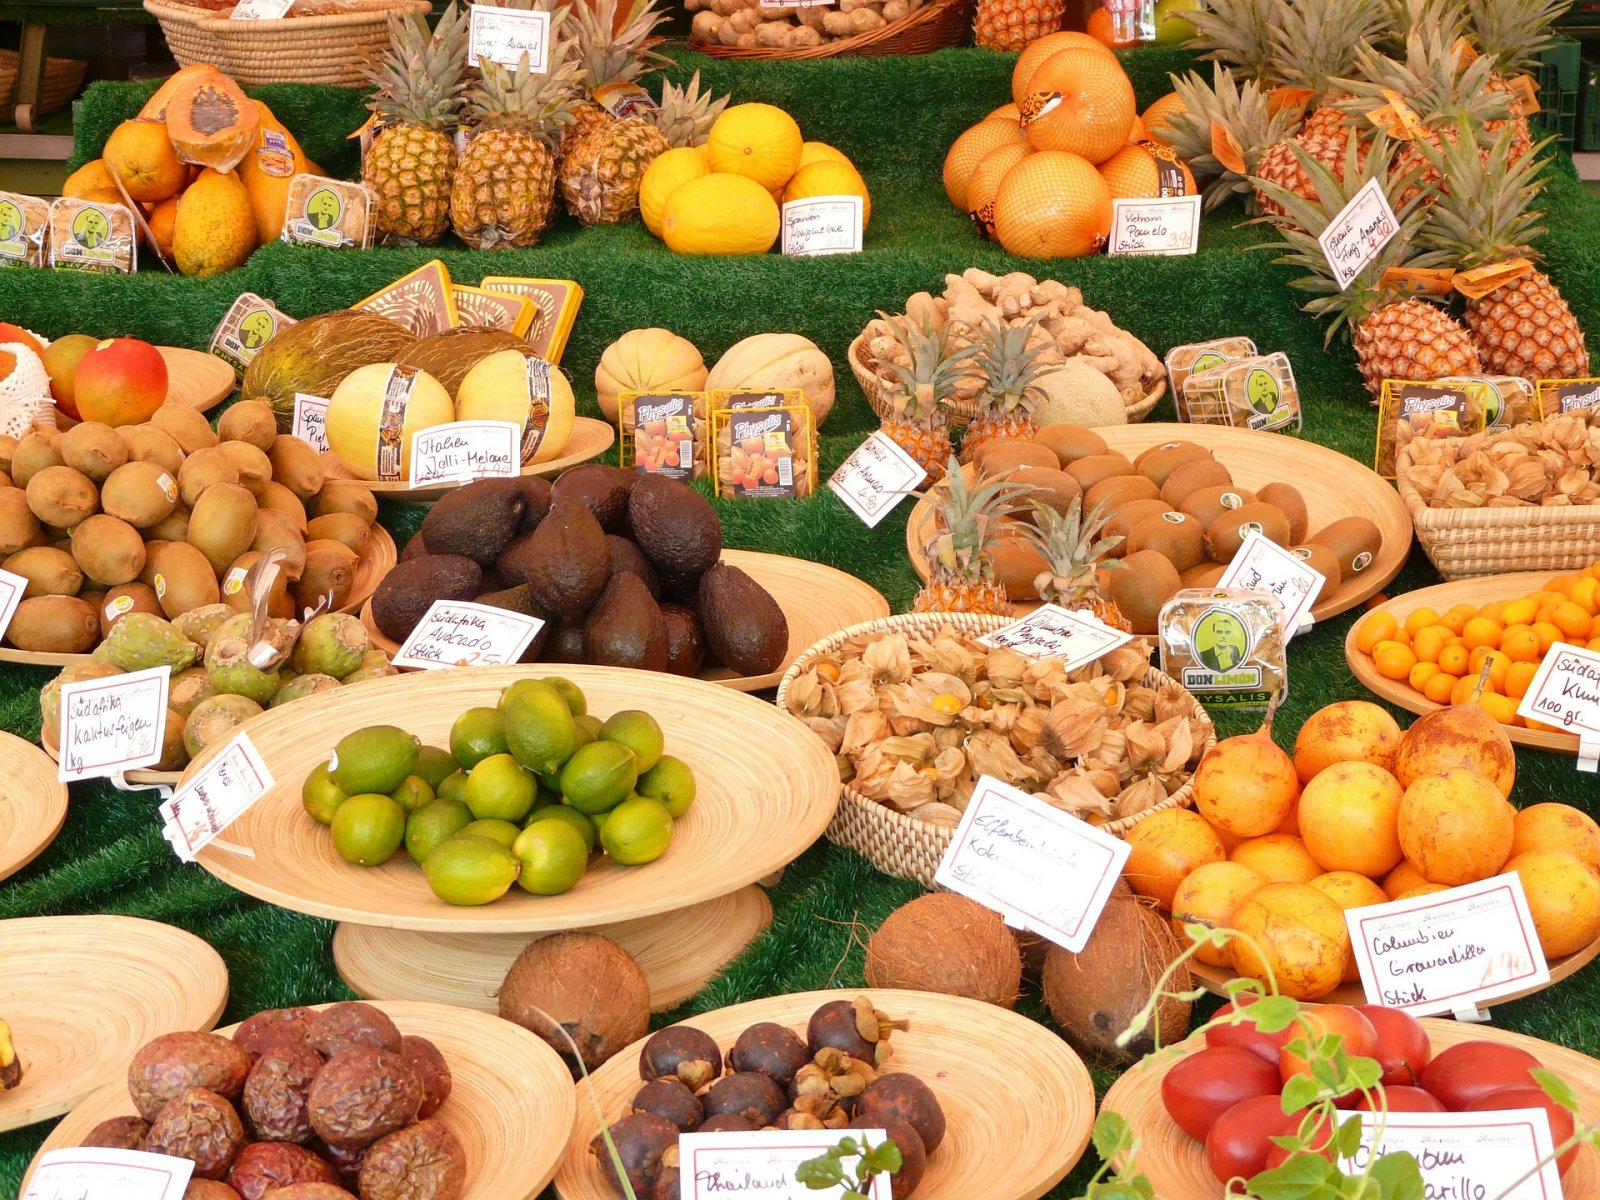 Fruites de mercat